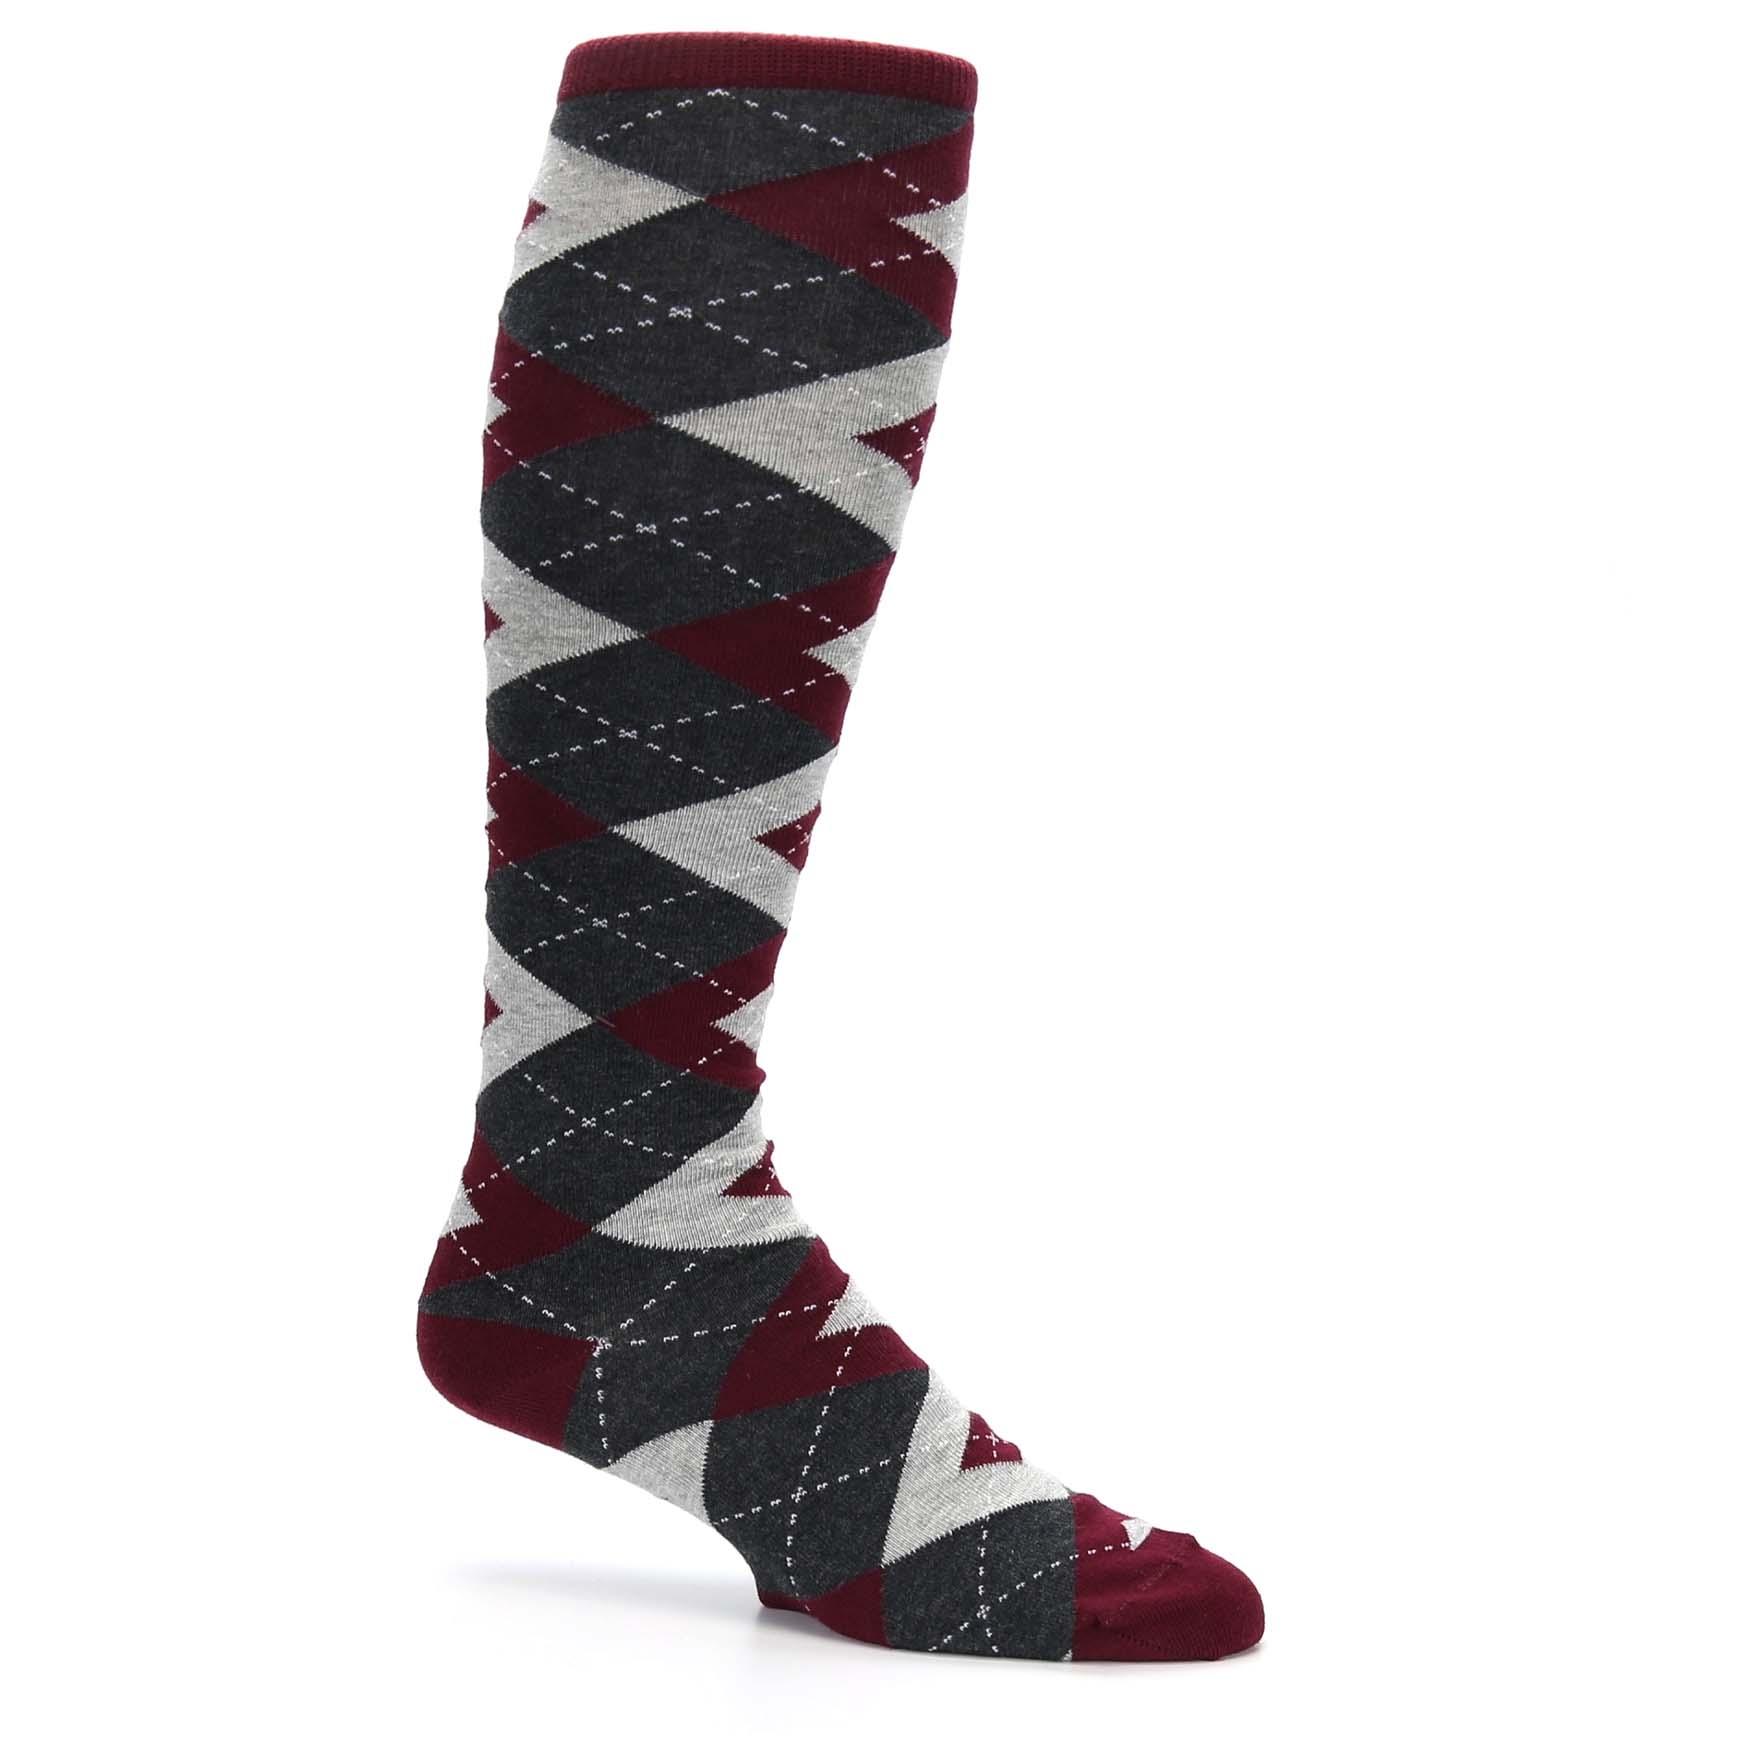 2f1afd24f29f Burgundy Gray Argyle Men's Over-the-Calf Dress Socks - Statement Sockwear